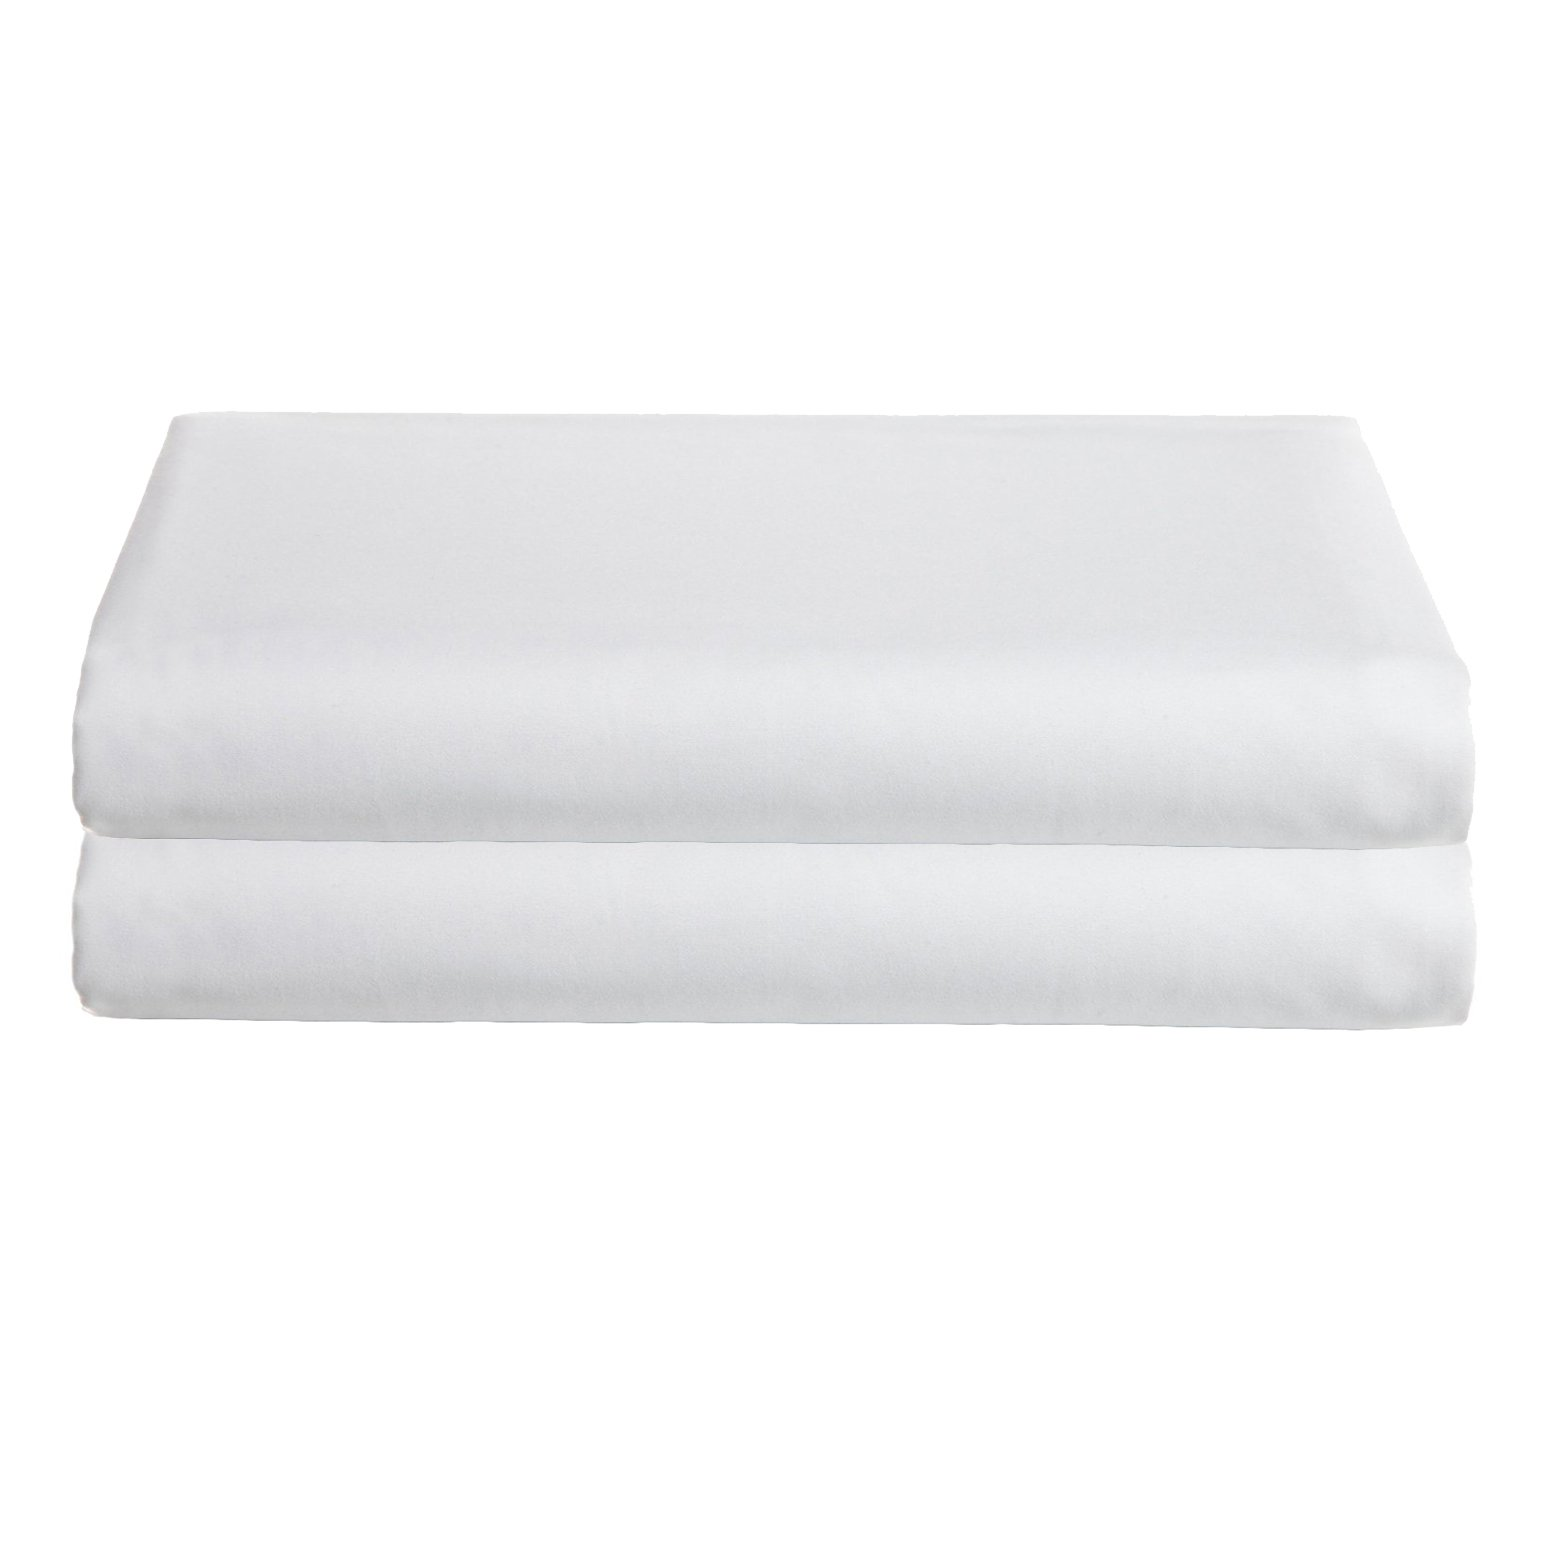 Babydoll Bedding Moses Basket Set of 2 Sheet, White, 13'' x 27''